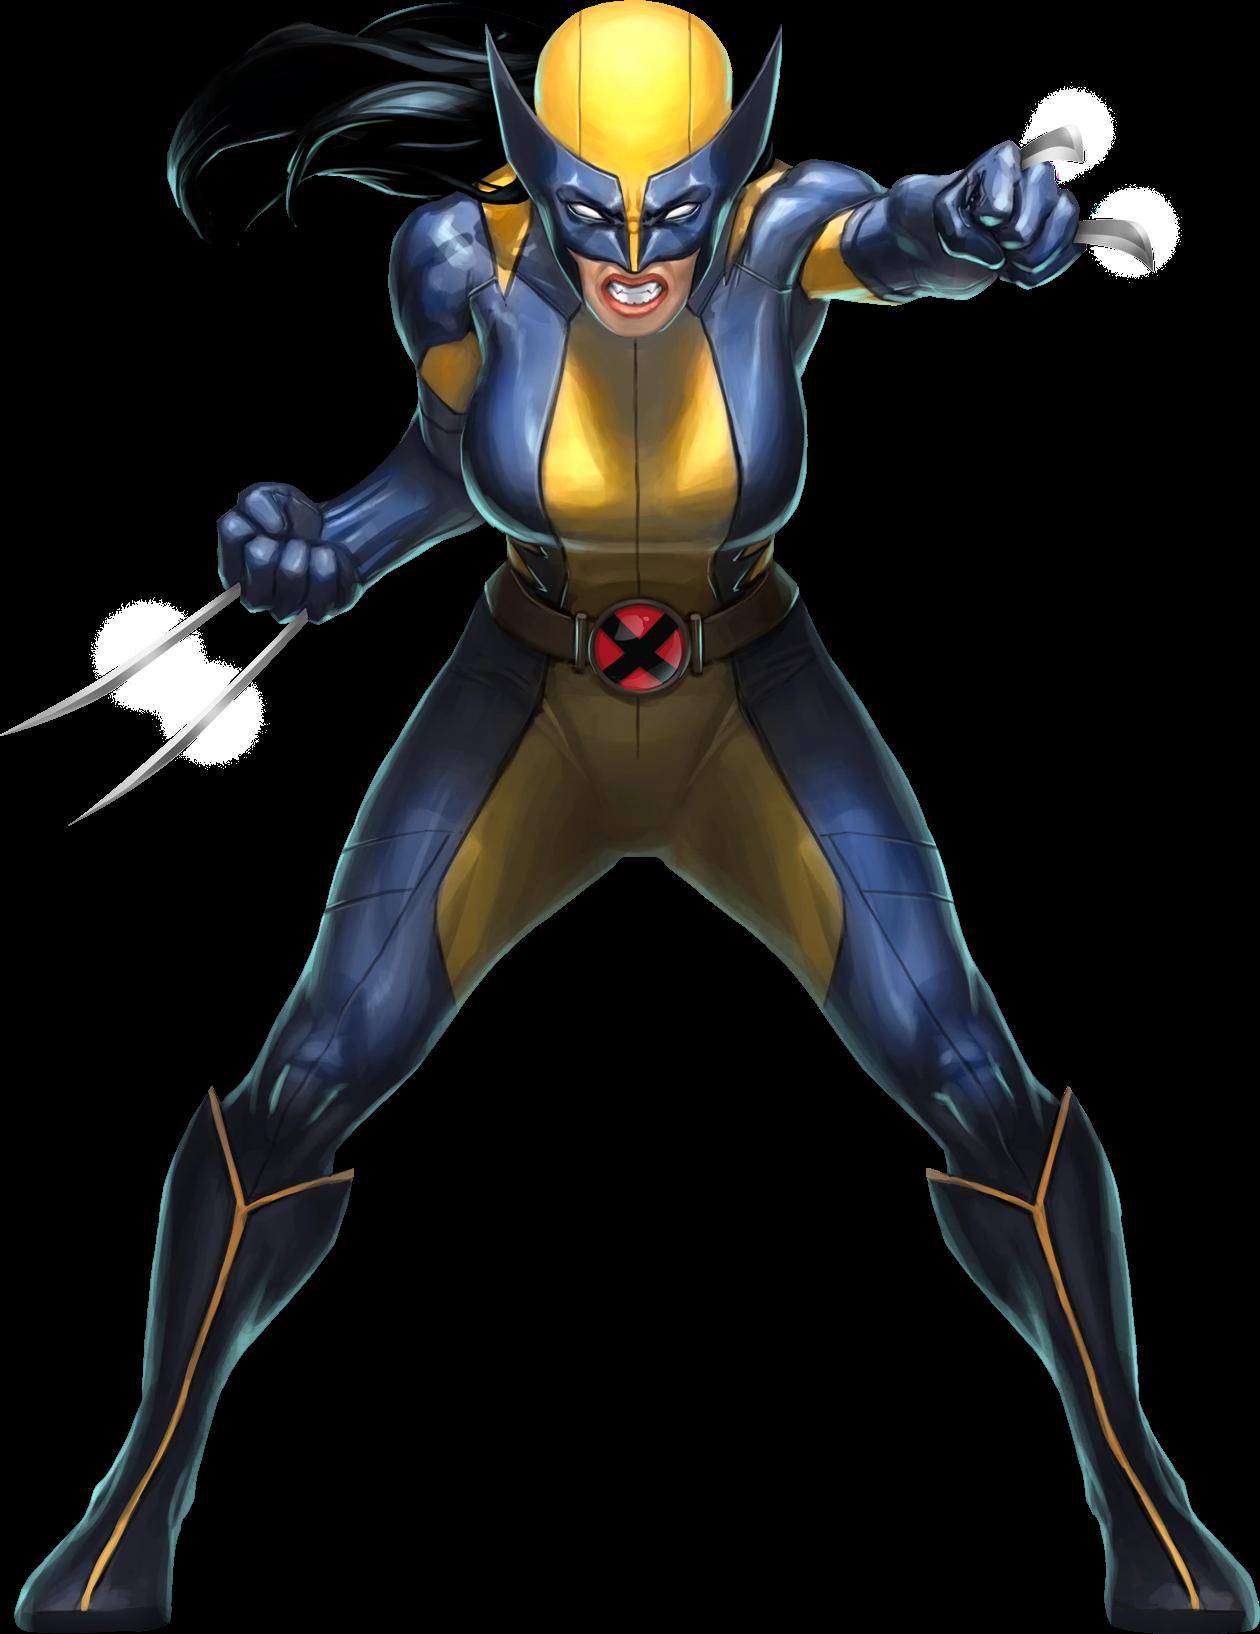 Marvel vs. Fantendo: Warzones